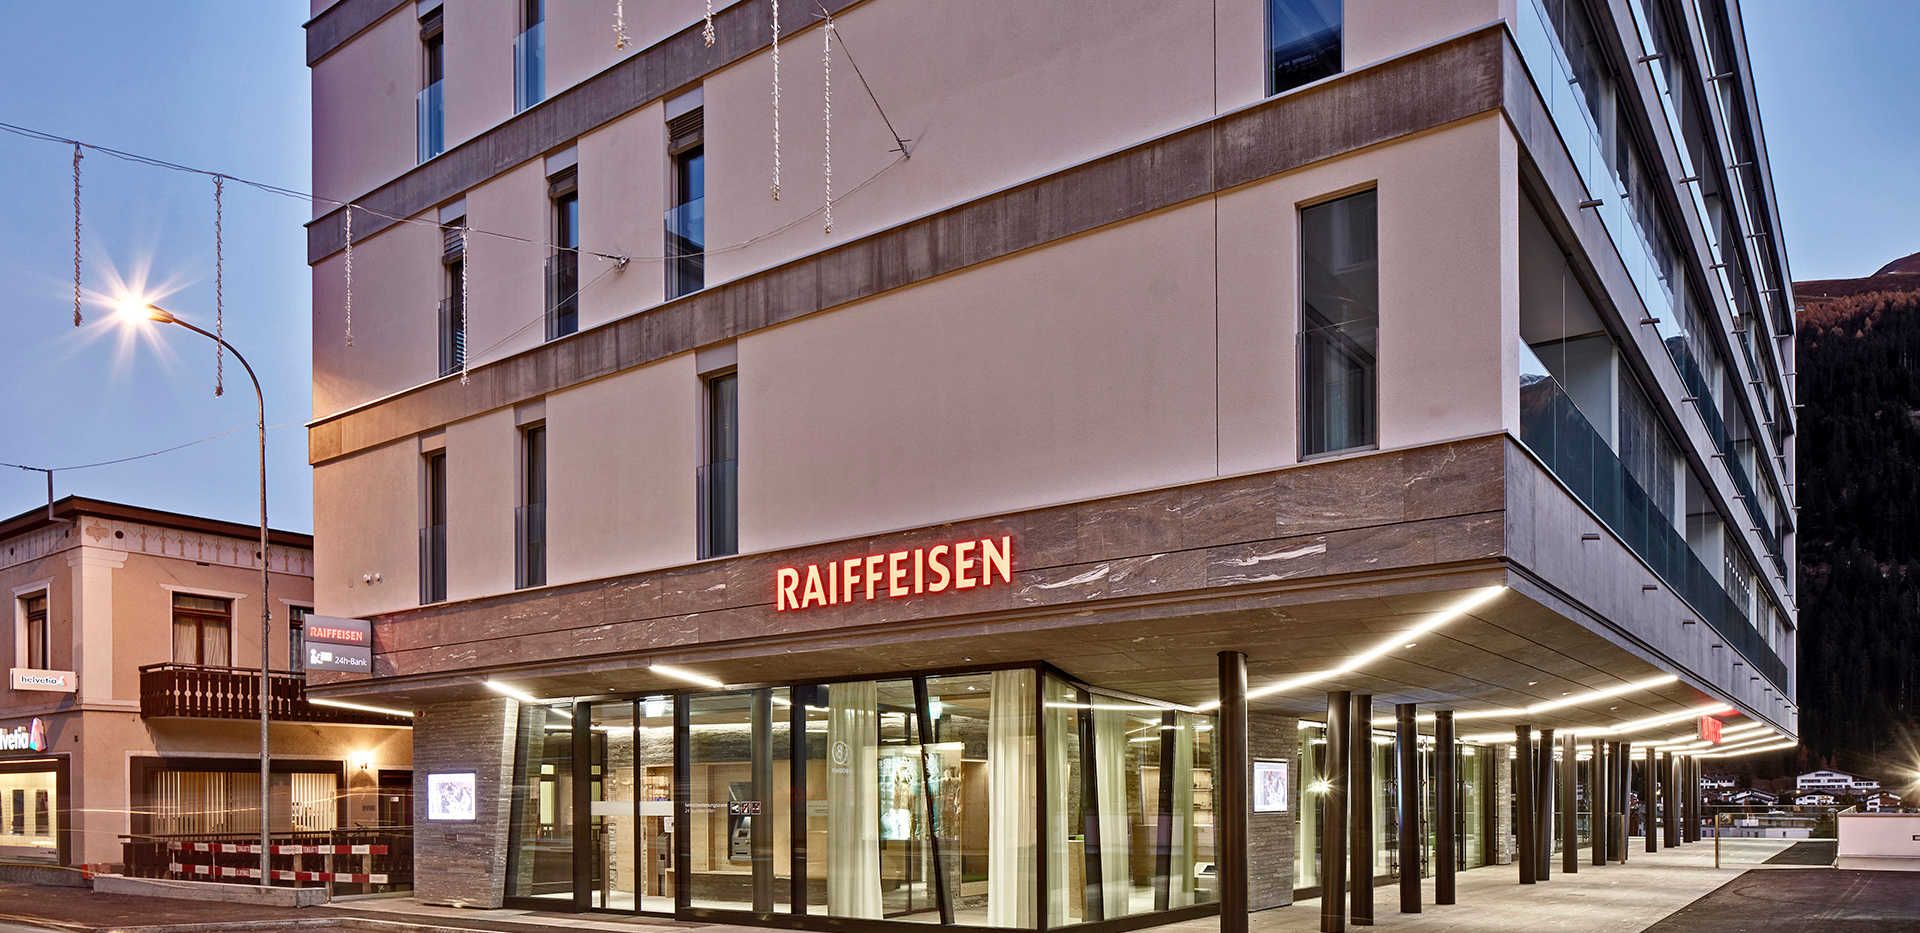 Raiffeisen_by R Dürr_36_ret.jpg